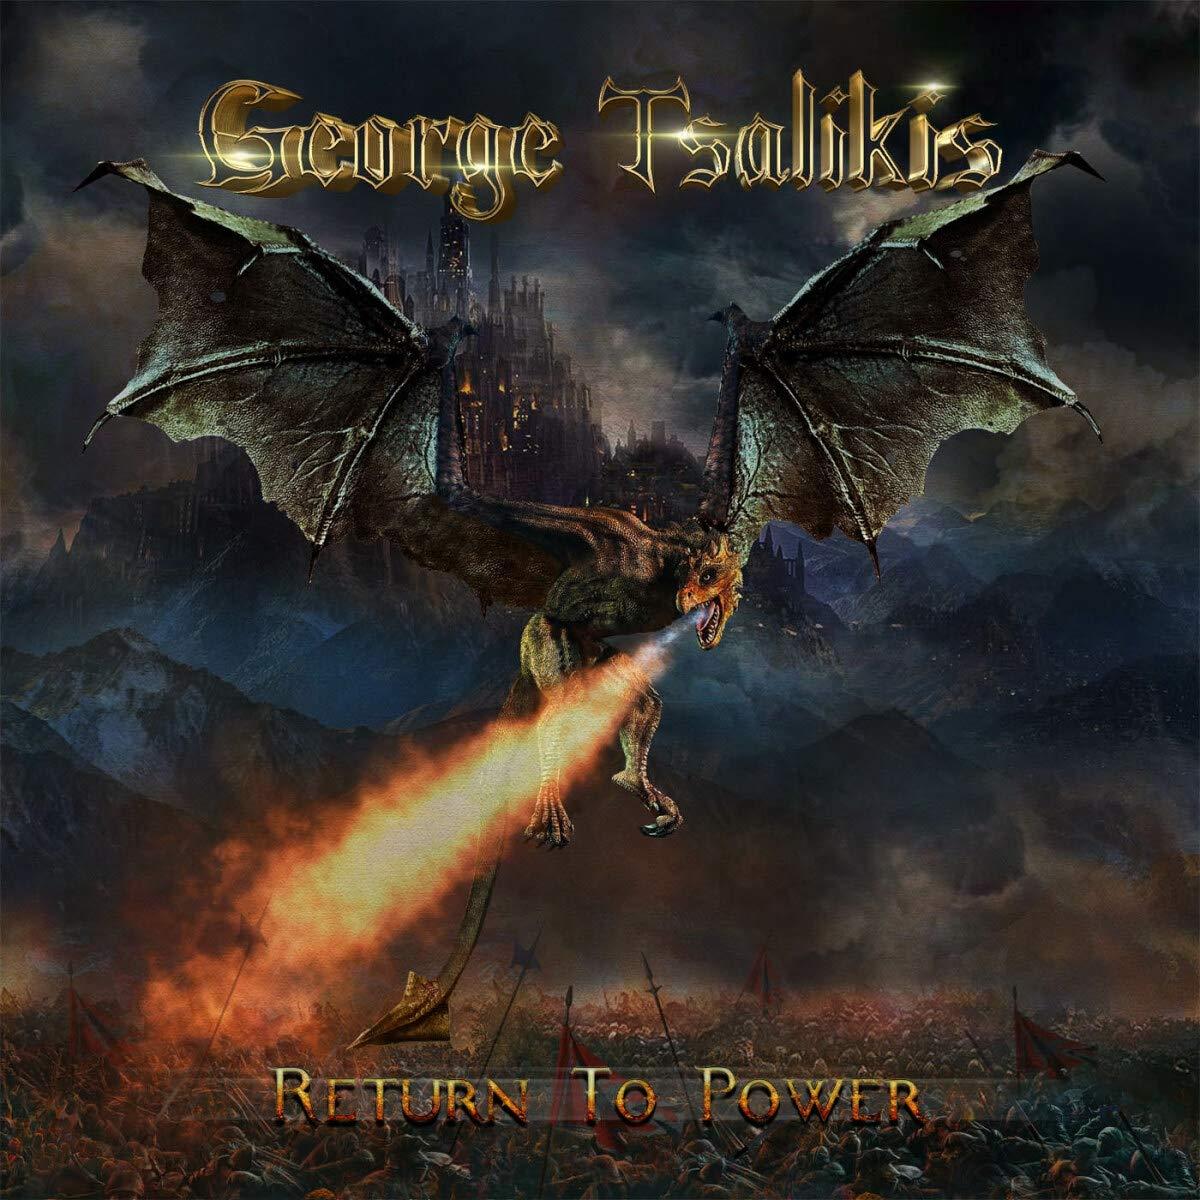 George Tsalikis - Return To Power (2021) [FLAC] Download